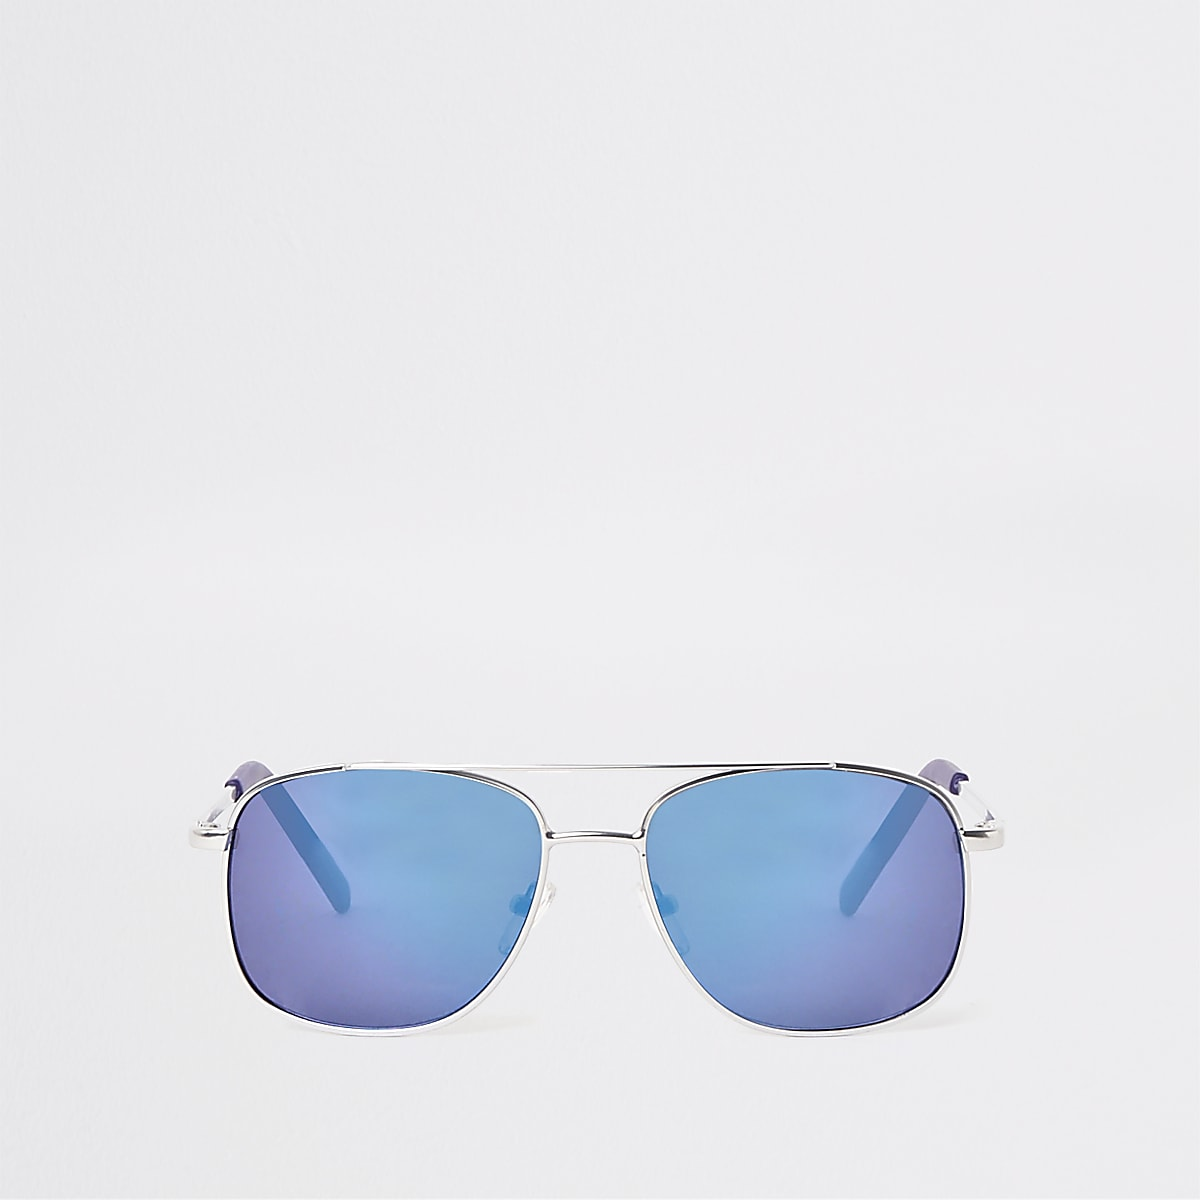 Boys silver tone blue lens sunglasses